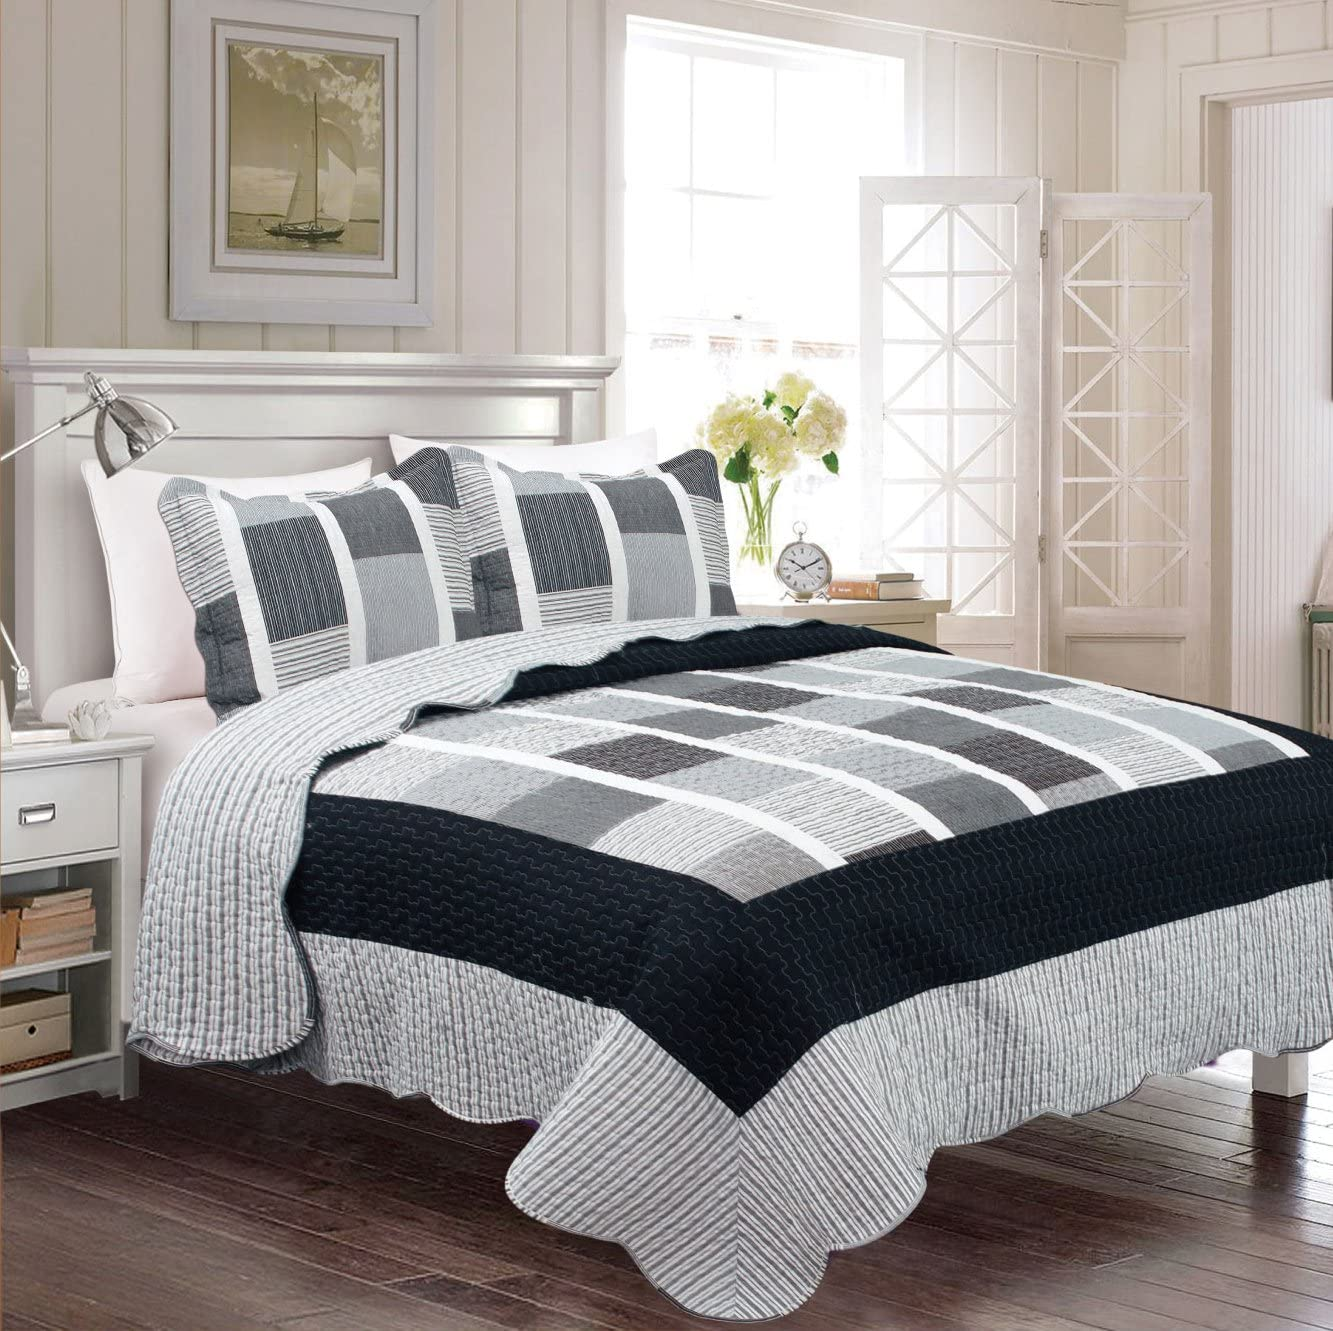 Twin//Twin XL Linen Plus Reversible Bedspread Set Squares Stripes Black White Grey New